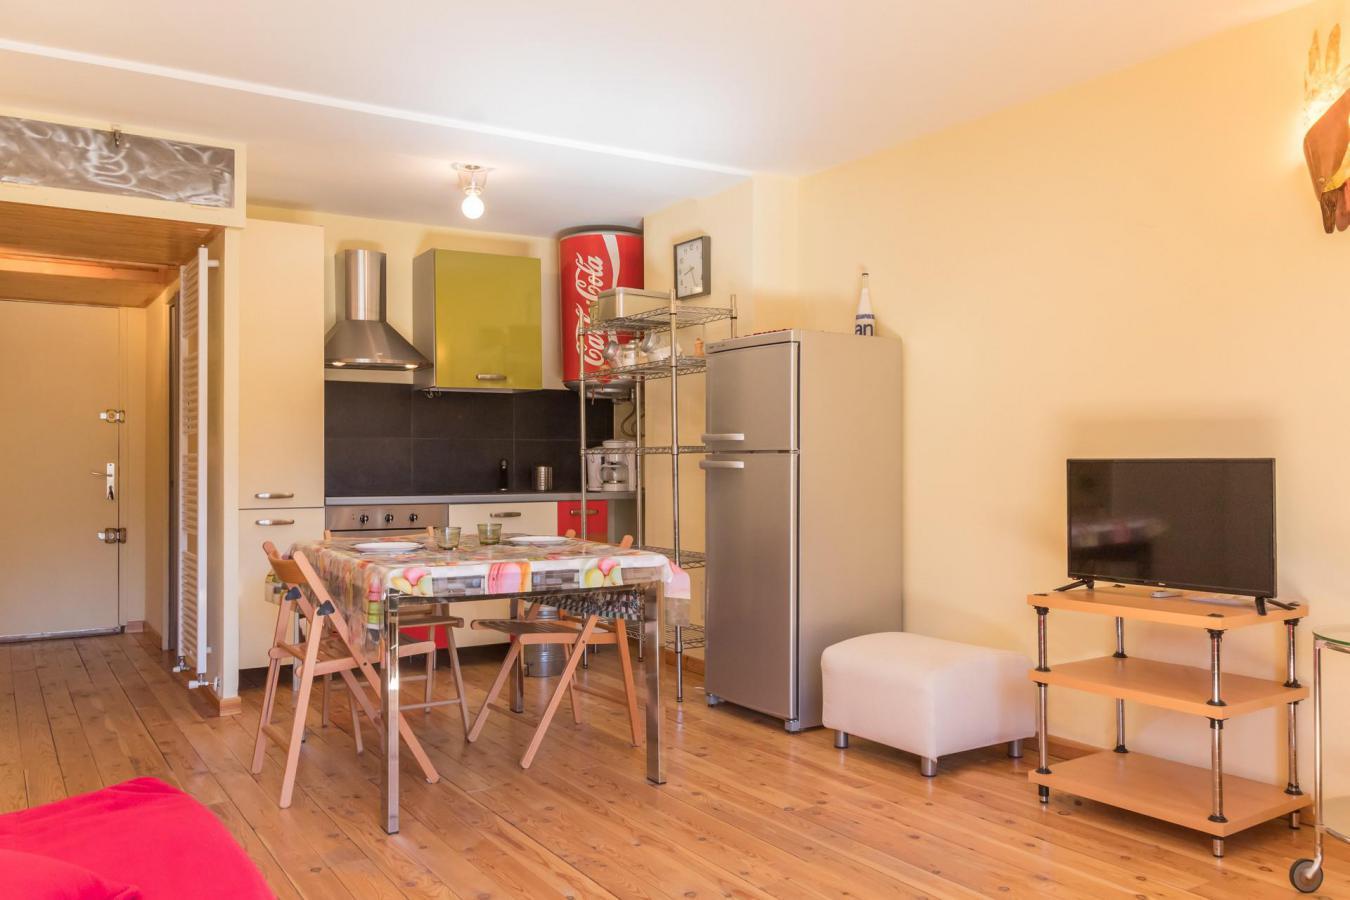 Location Residence Les Alpets